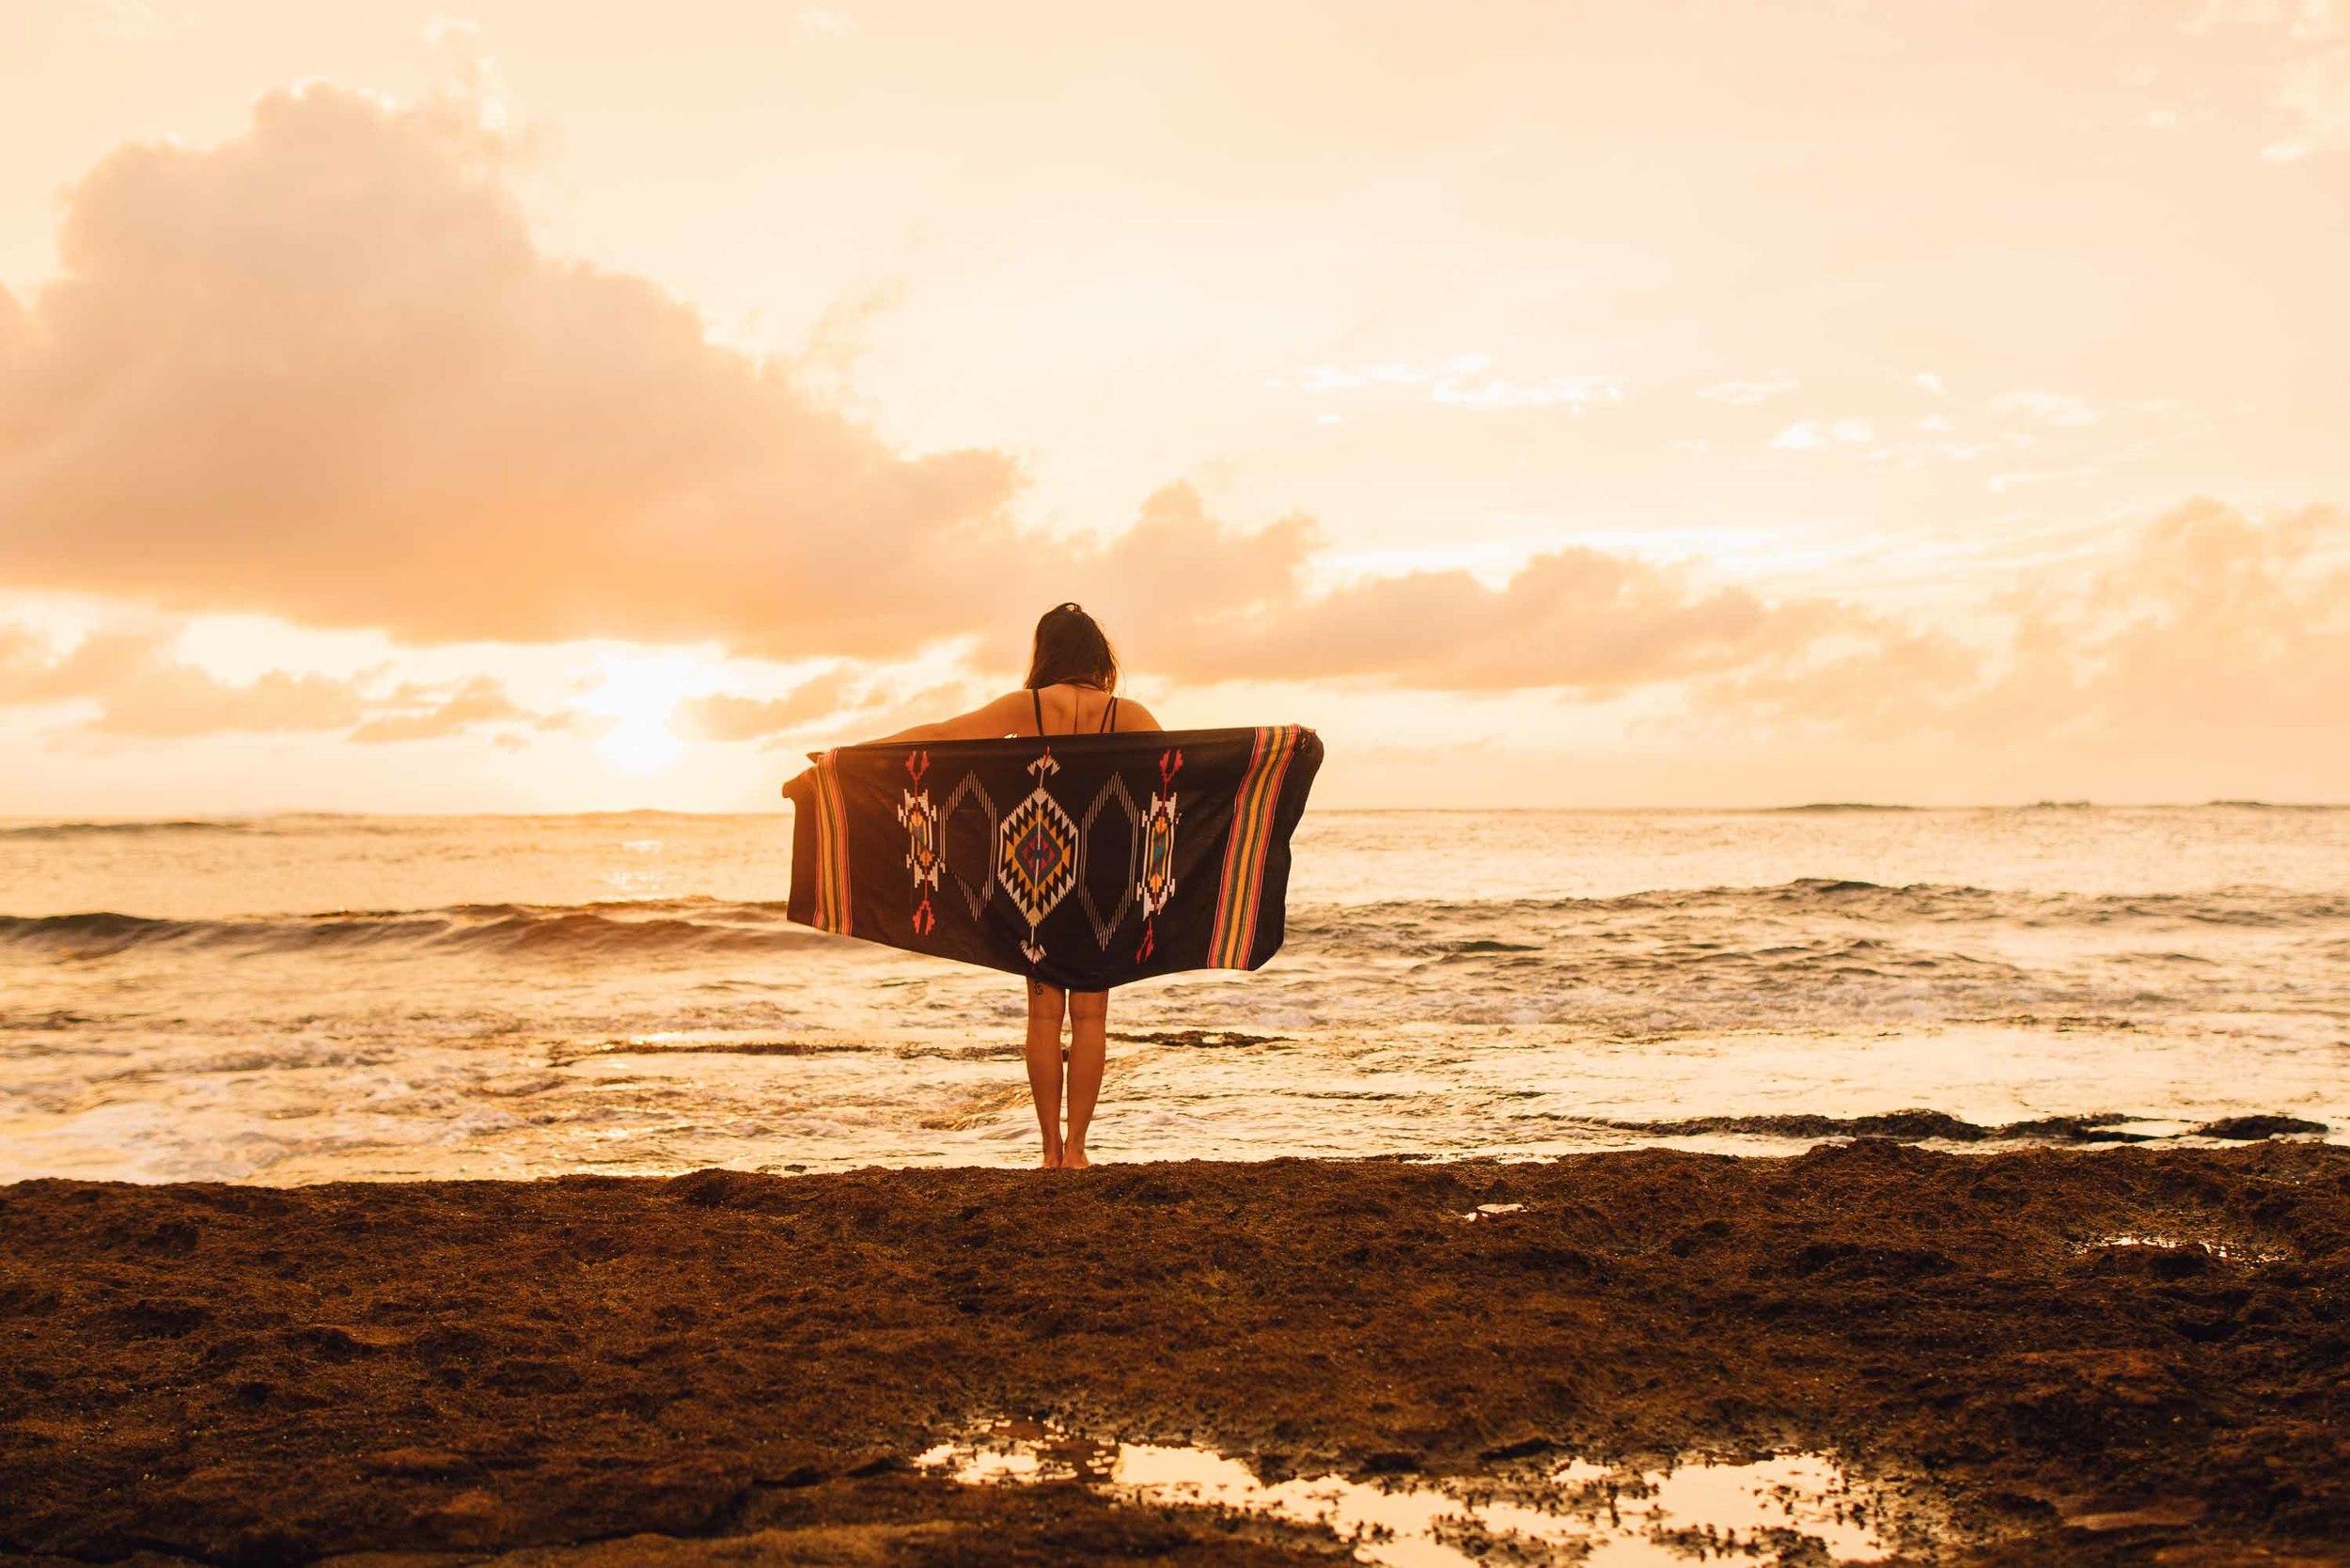 bryce-johnson-kauai-fj40-toyota-landcruiser-aloha exchange-slowtide-12.jpg